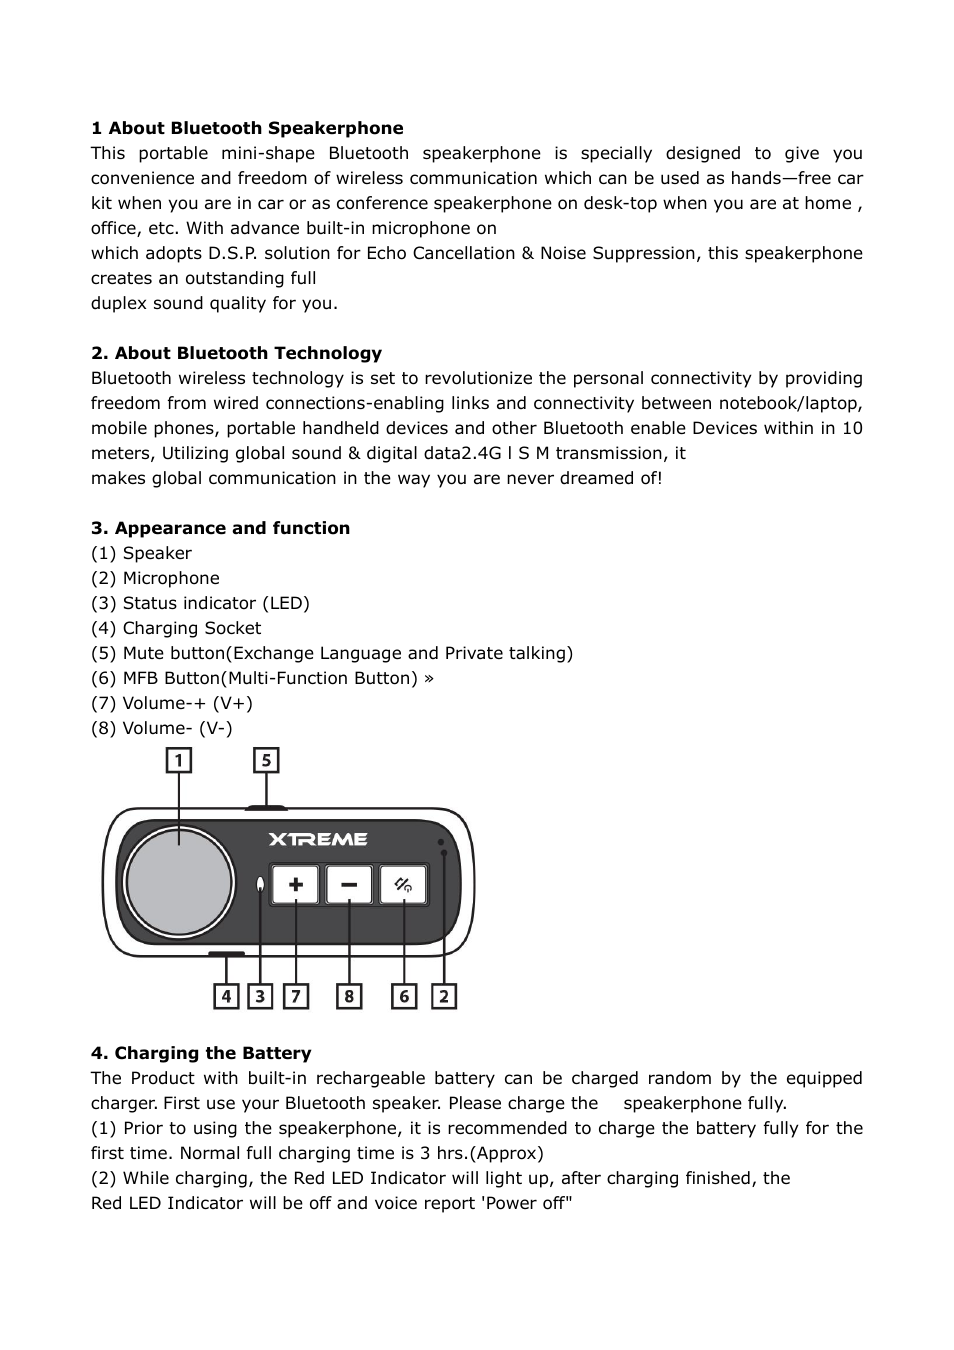 Xtreme Bluetooth 51901 Driver